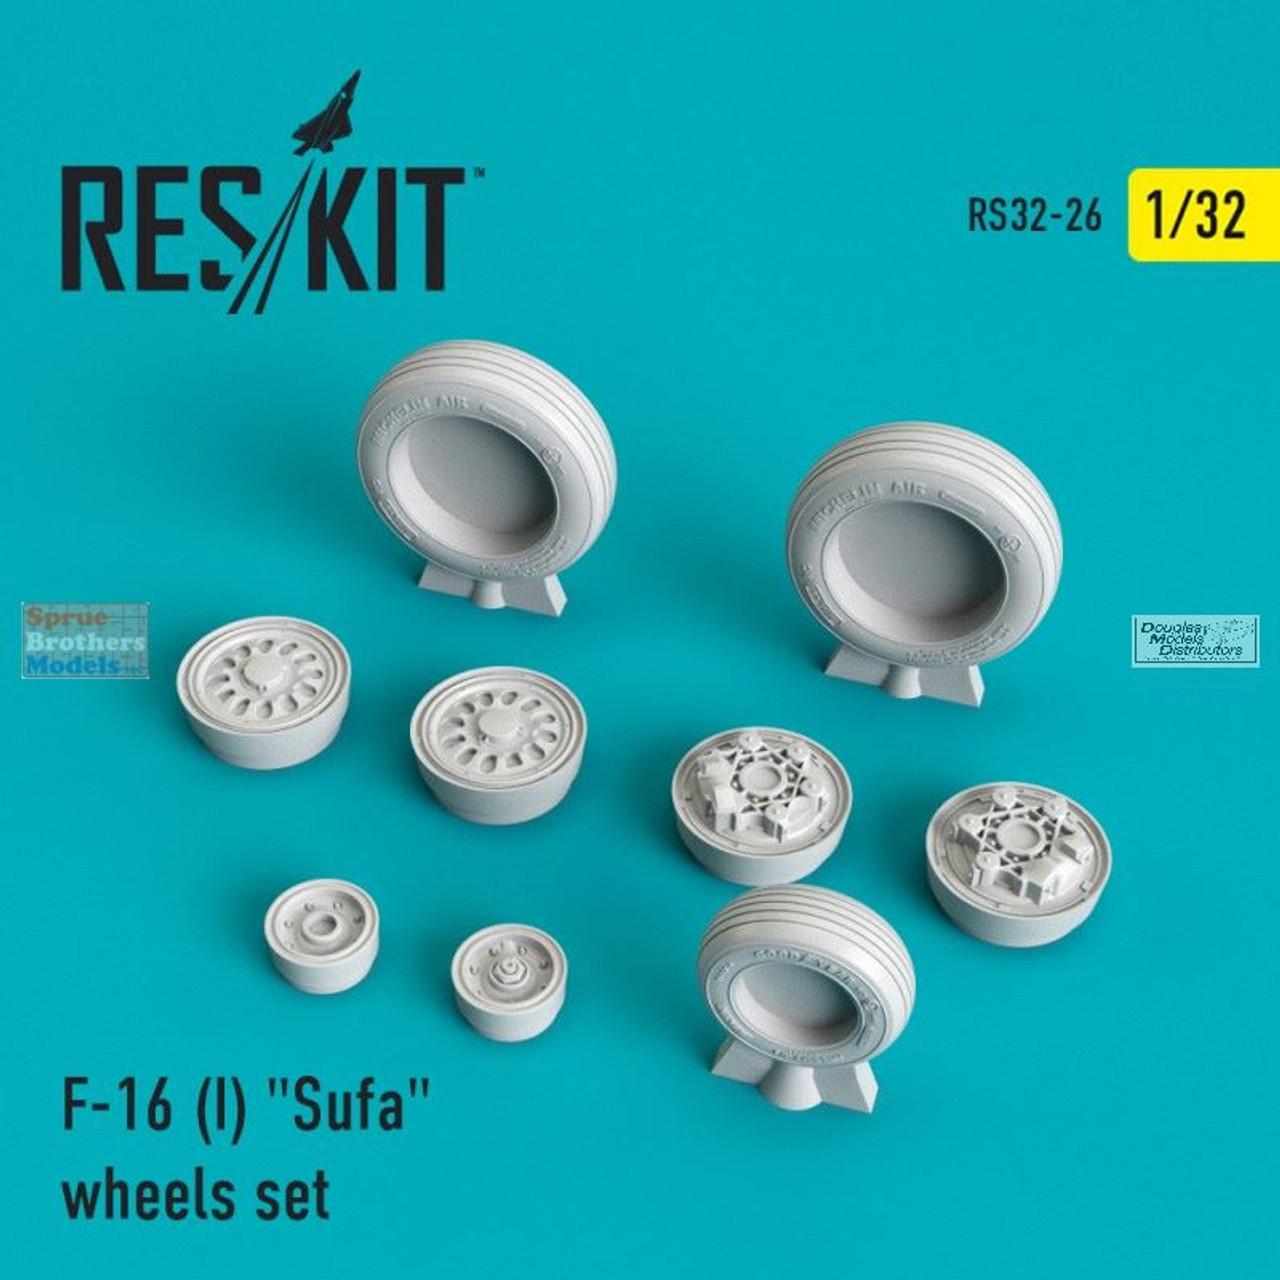 RESRS320026 1:32 ResKit F-16I Sufa Wheels Set